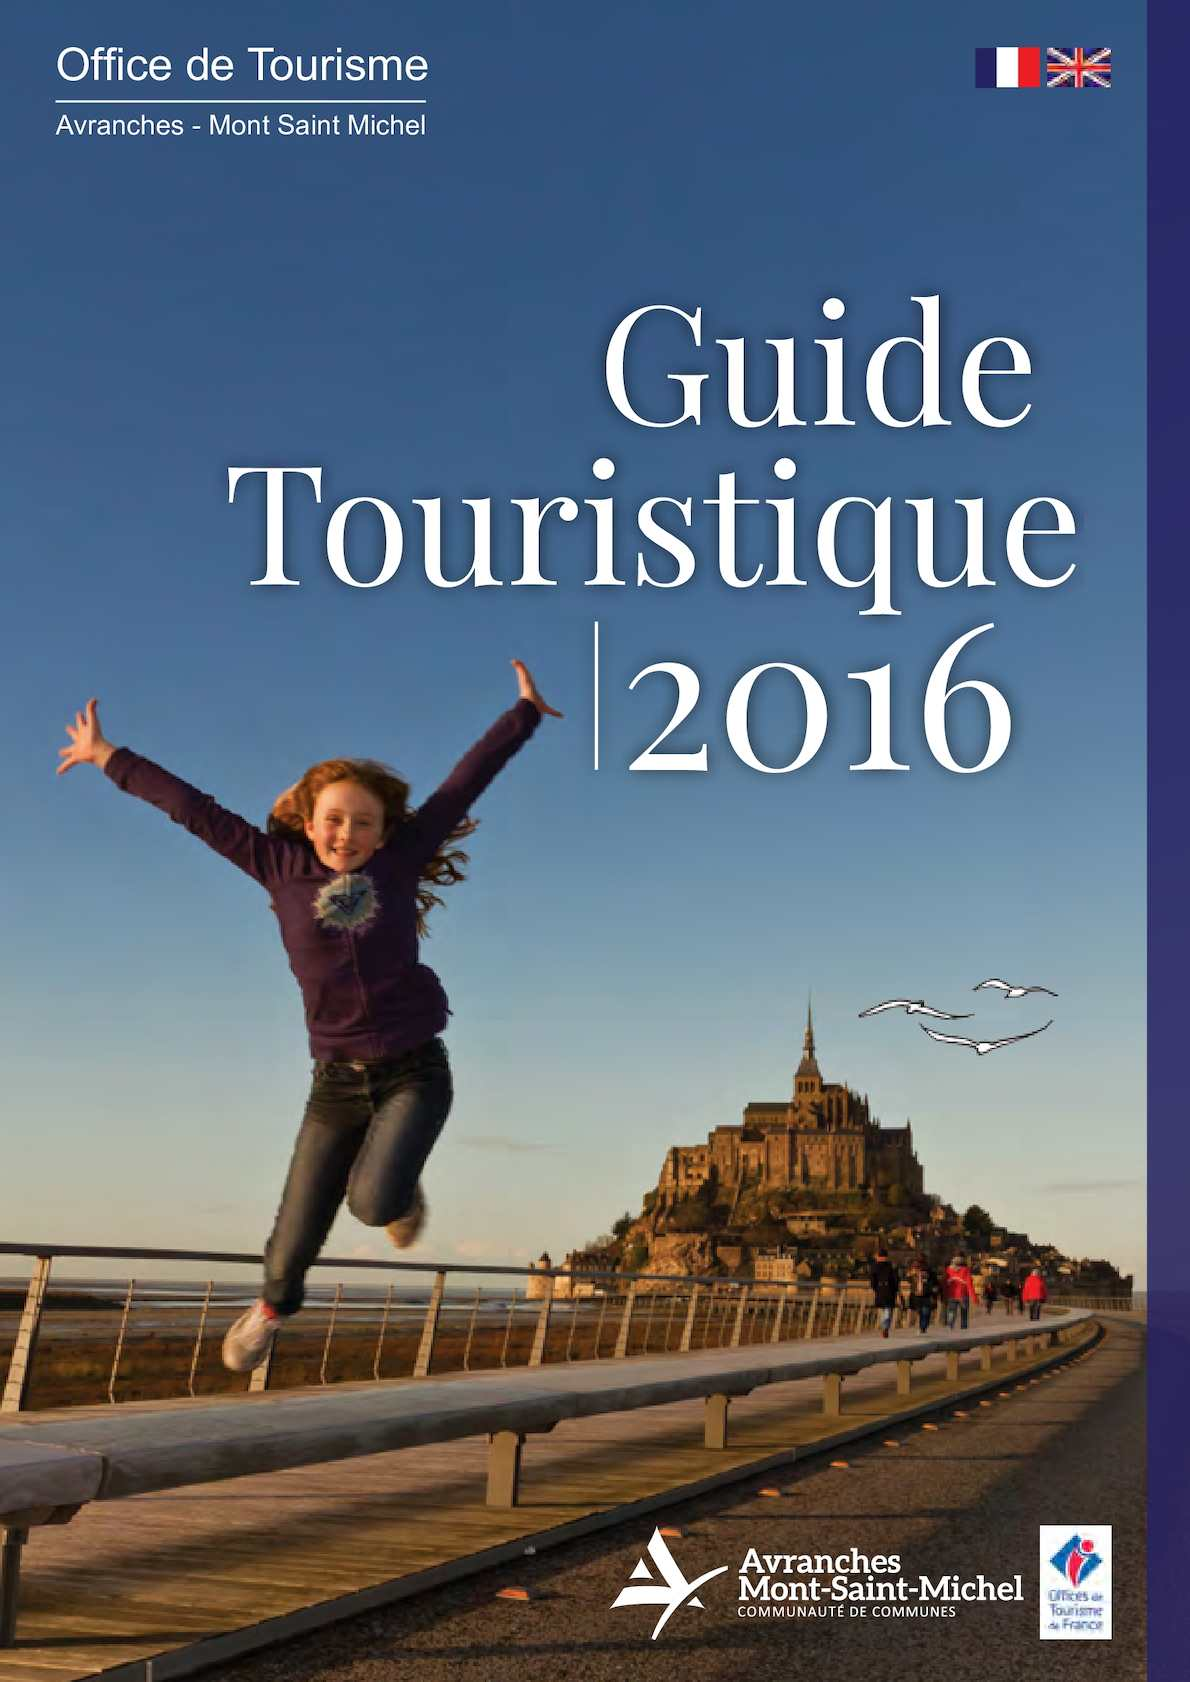 Calam o guide touristique 2016 avranches mont saint michel - Office du tourisme du mont saint michel ...